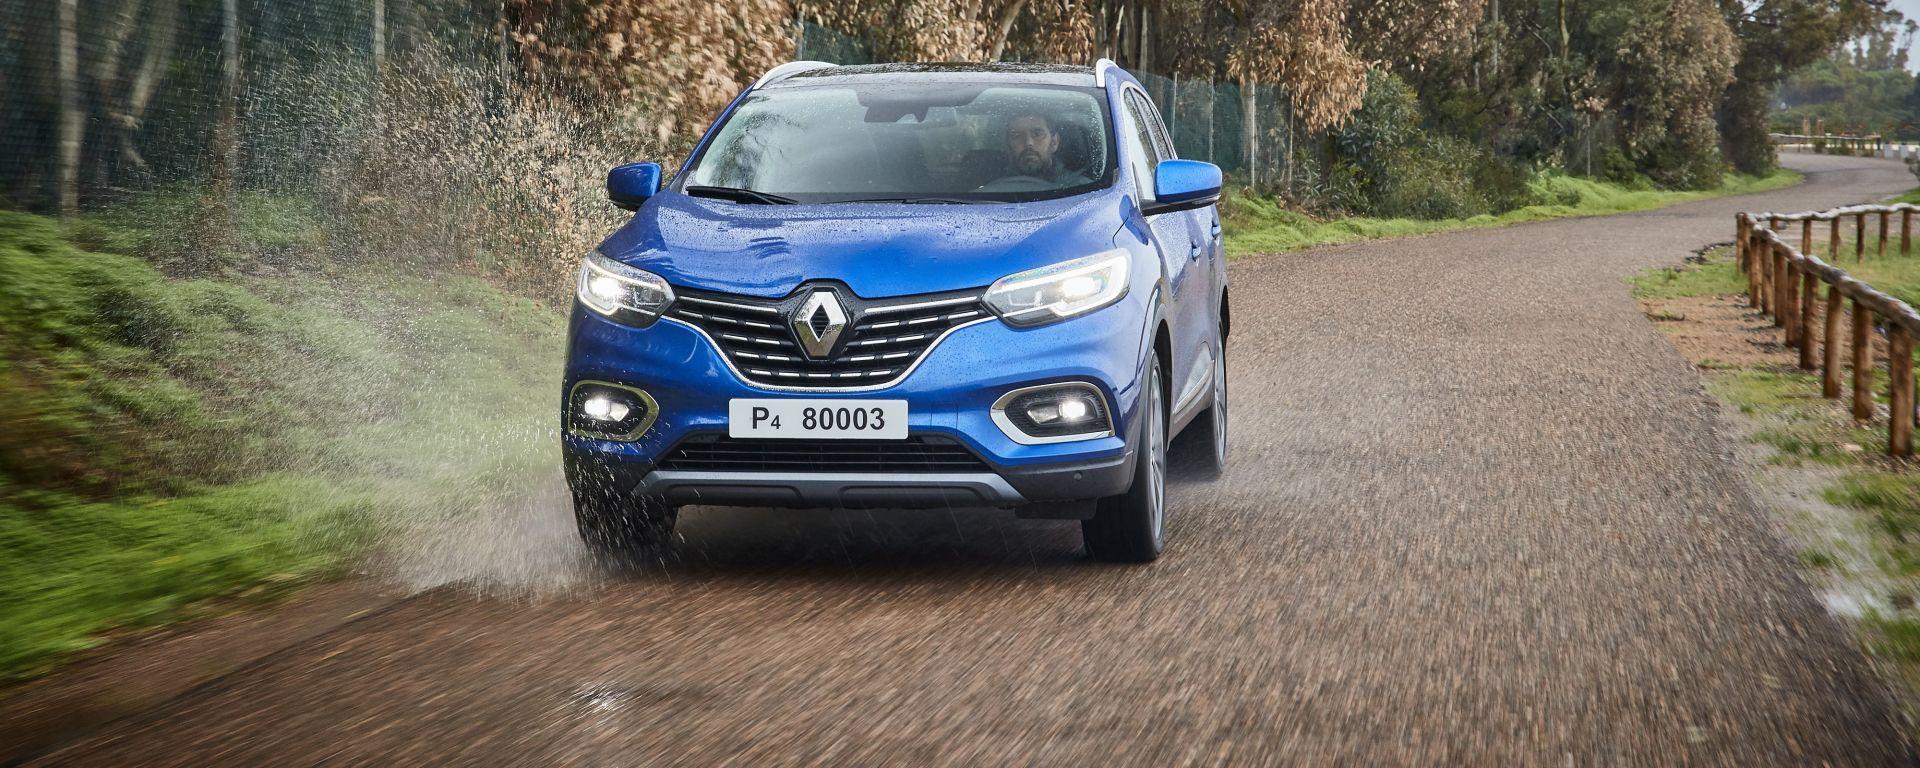 Renault Kadjar 2019: quanto è cambiata davvero?